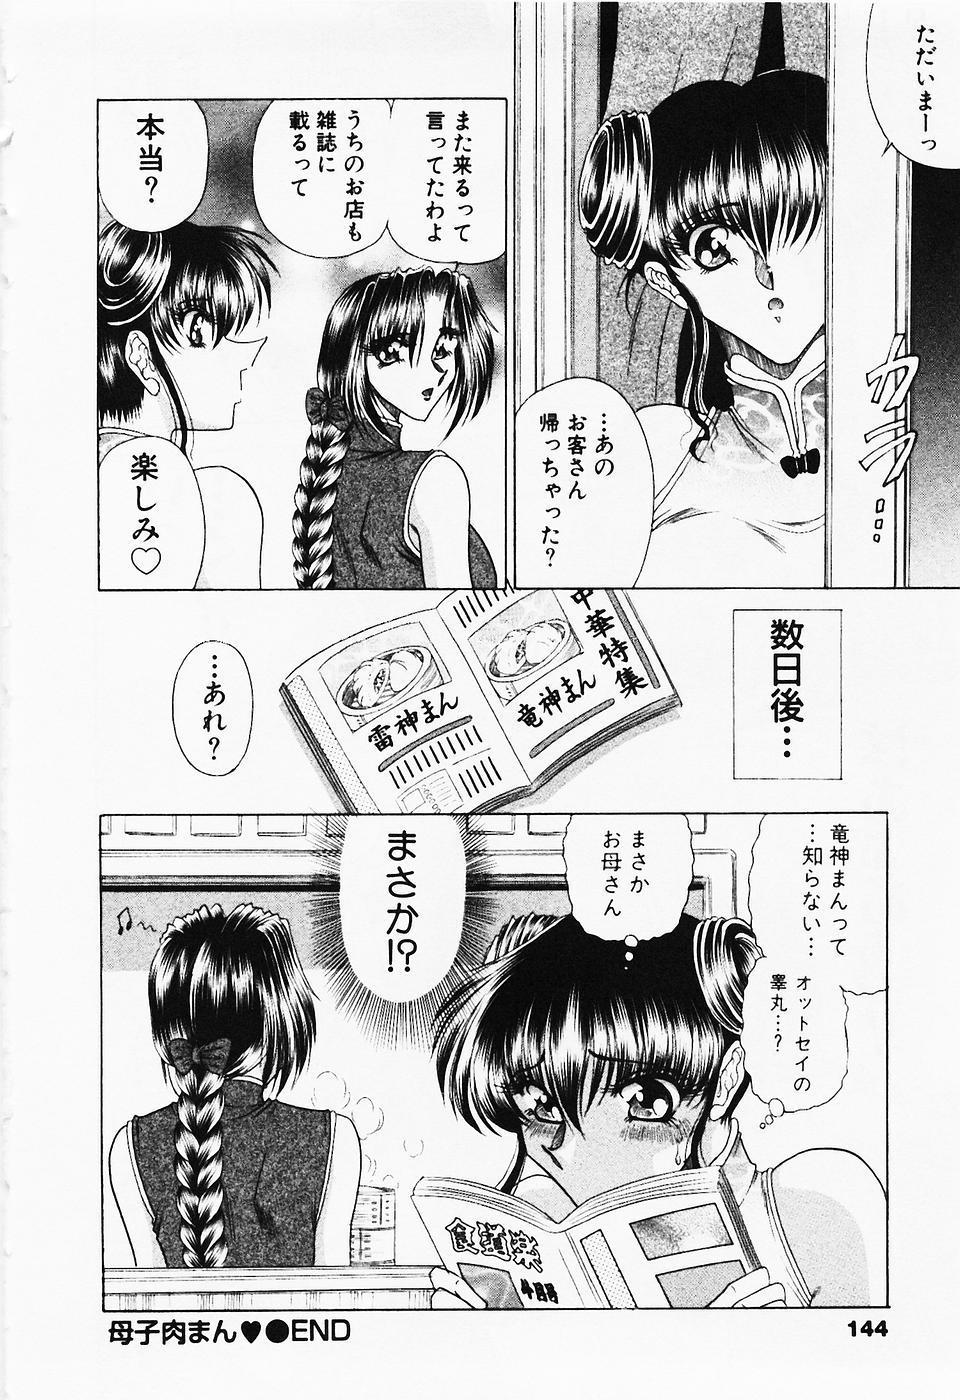 Seifuku Zanmai 142